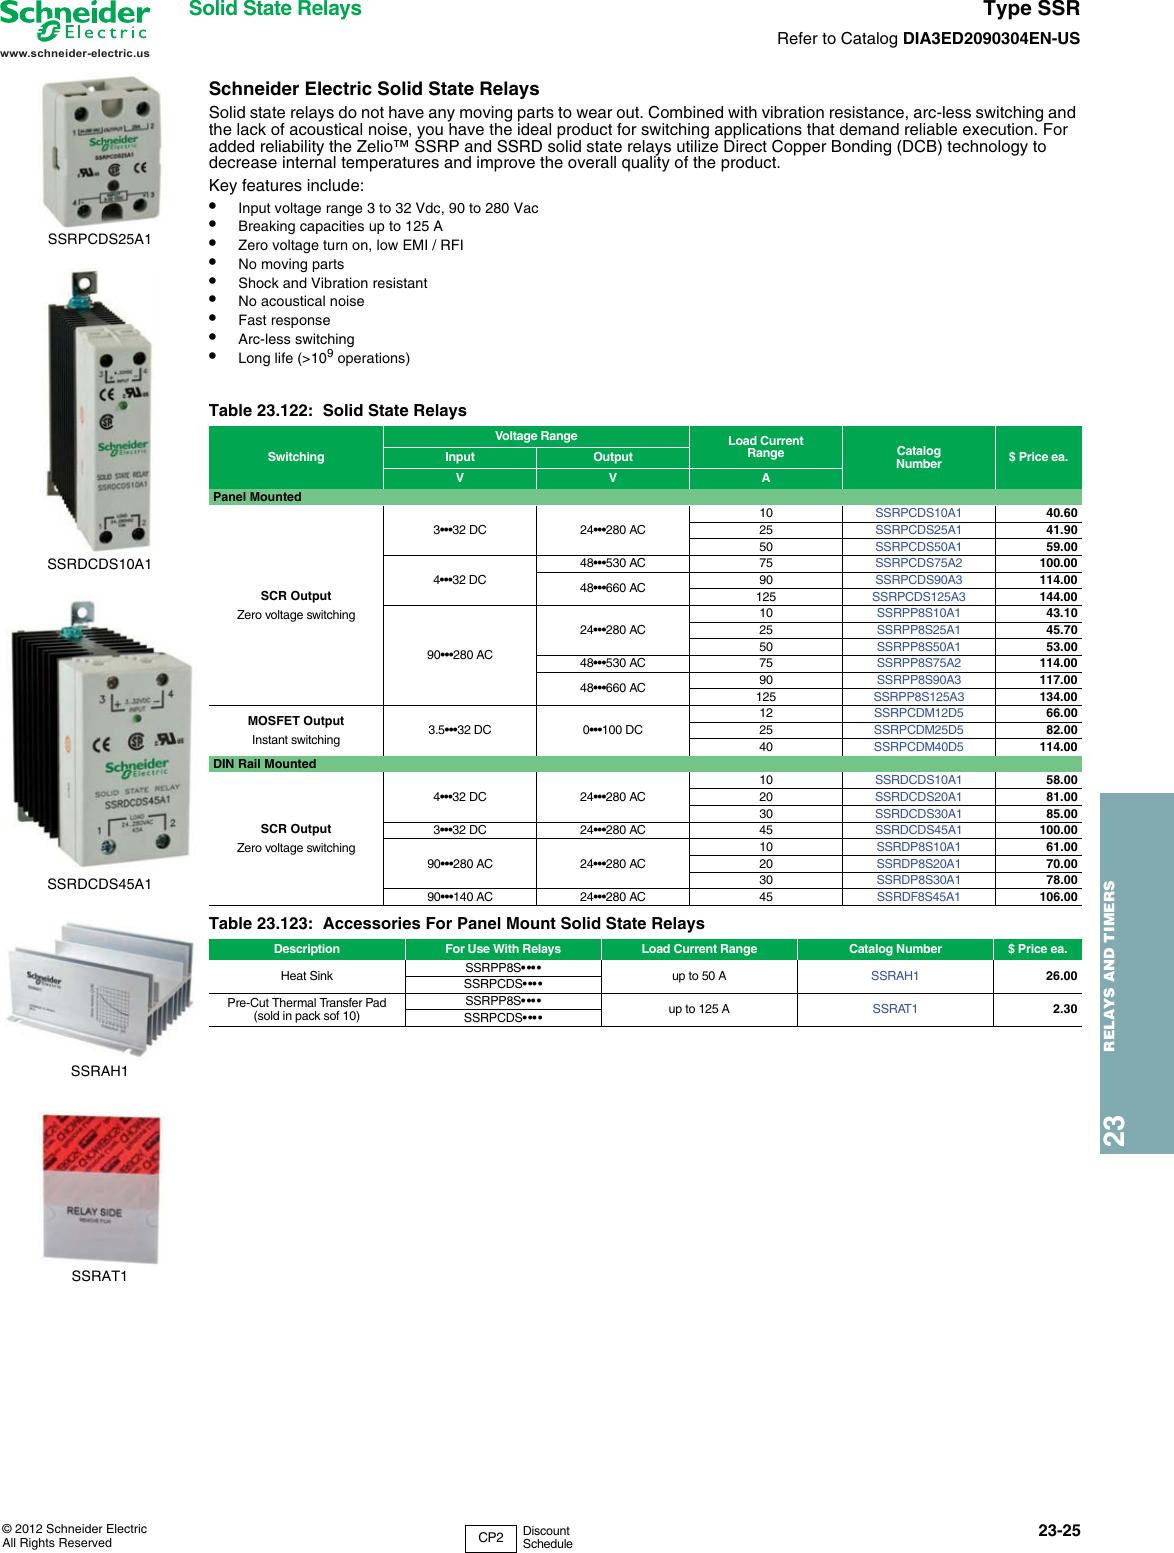 Rs44b Price